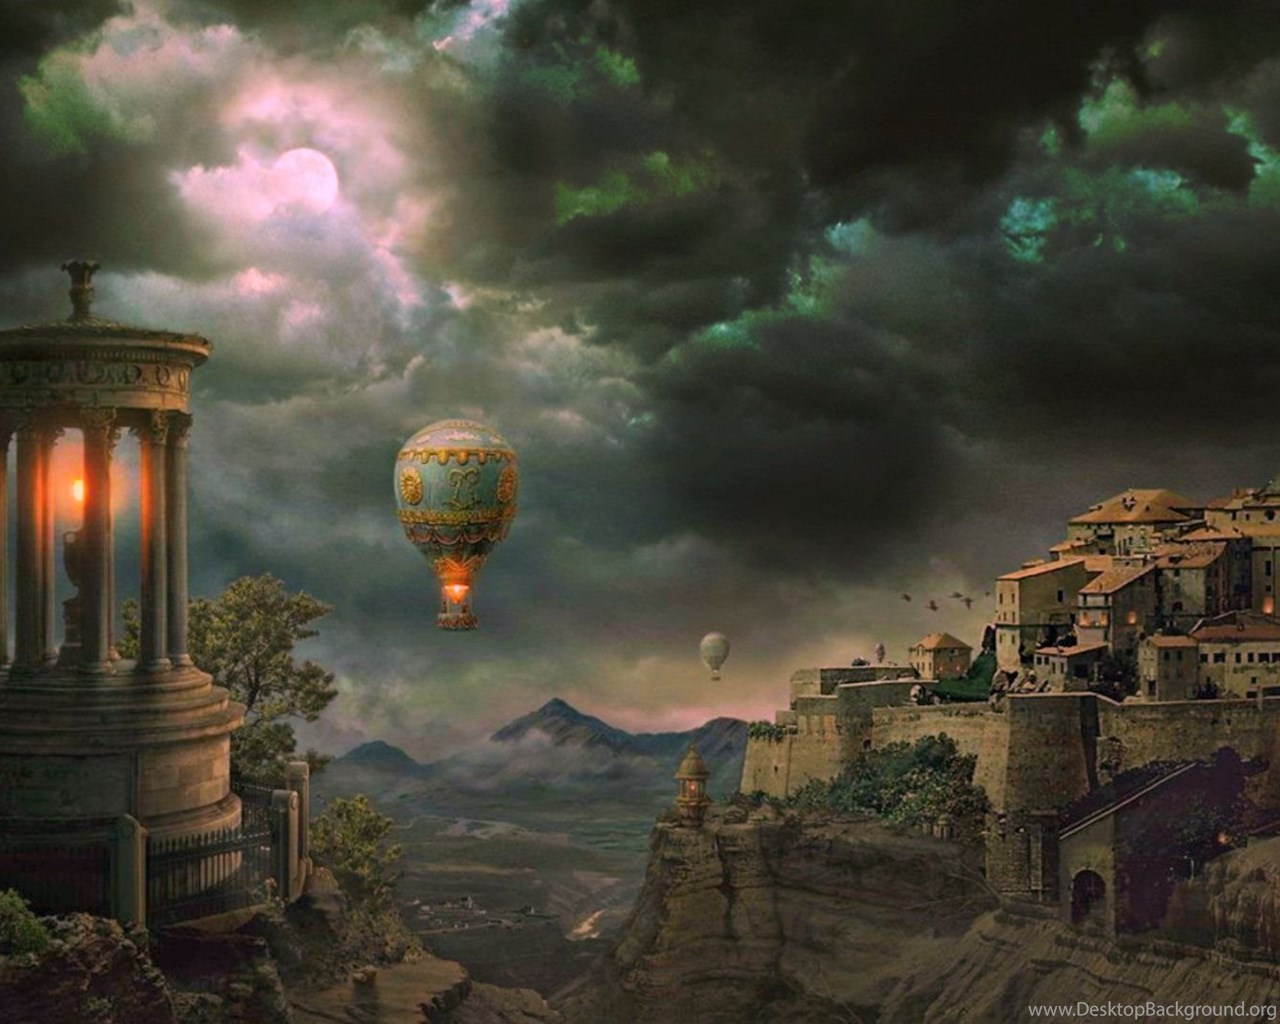 Fantasy World Ipad Wallpaper: Fantasy World Wallpapers Widescreen Desktop Background